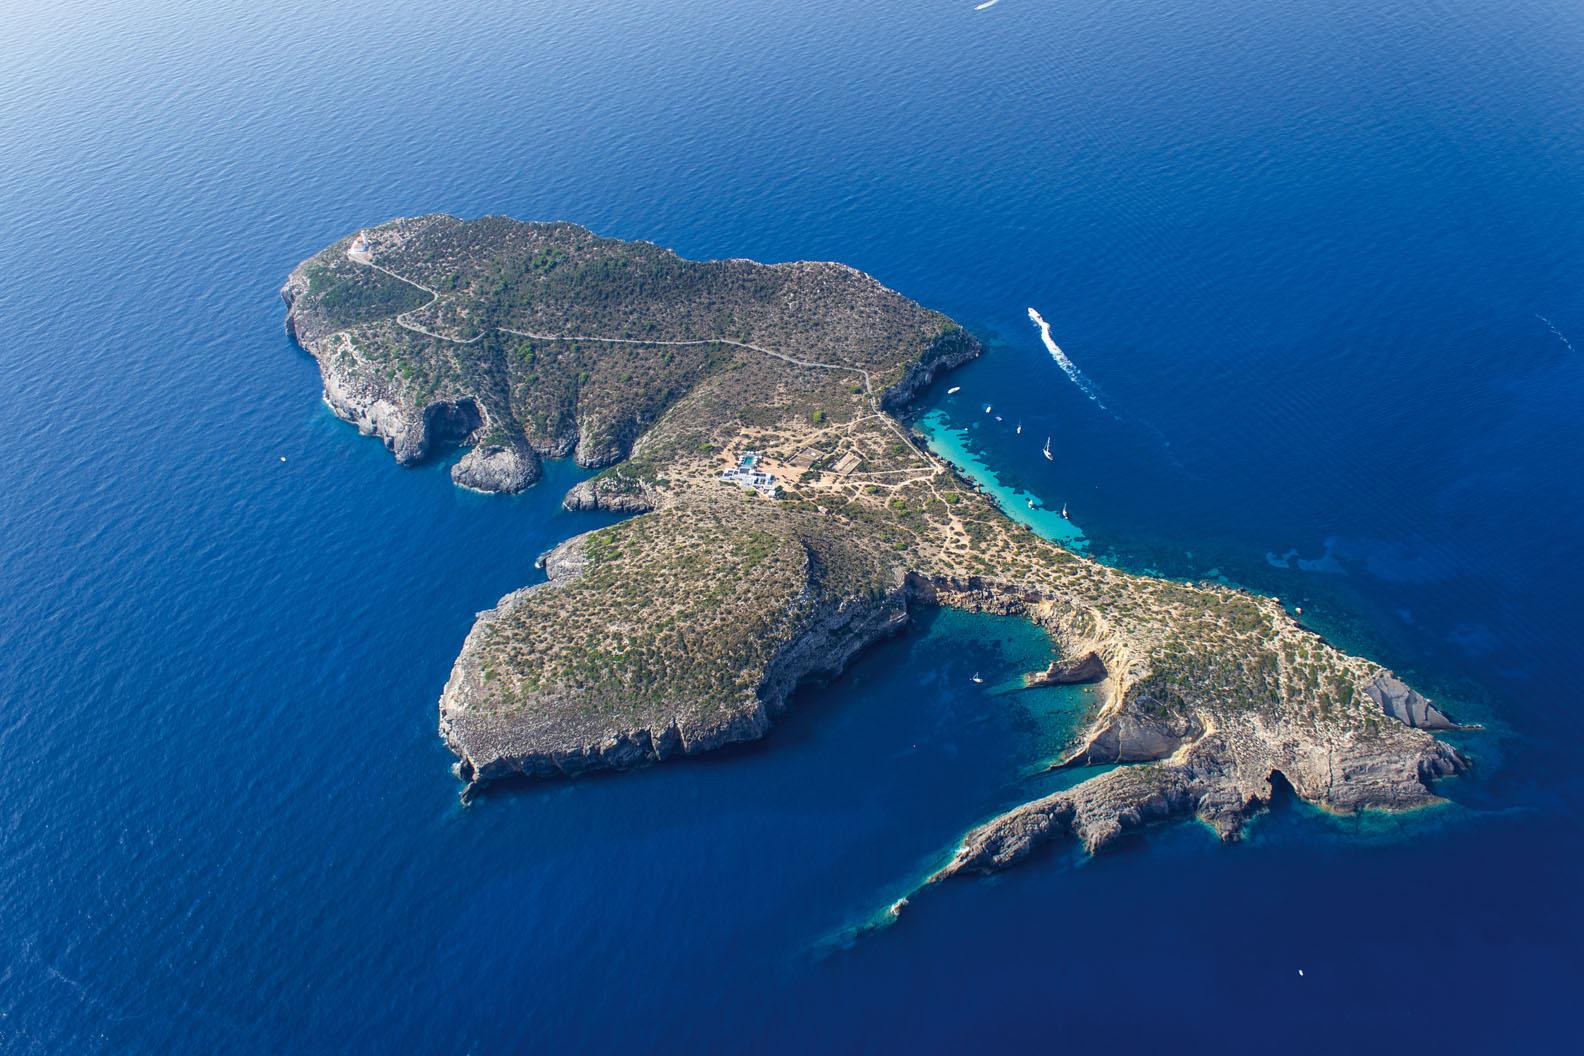 Tagomago-Europes Most Exclusive Private Island